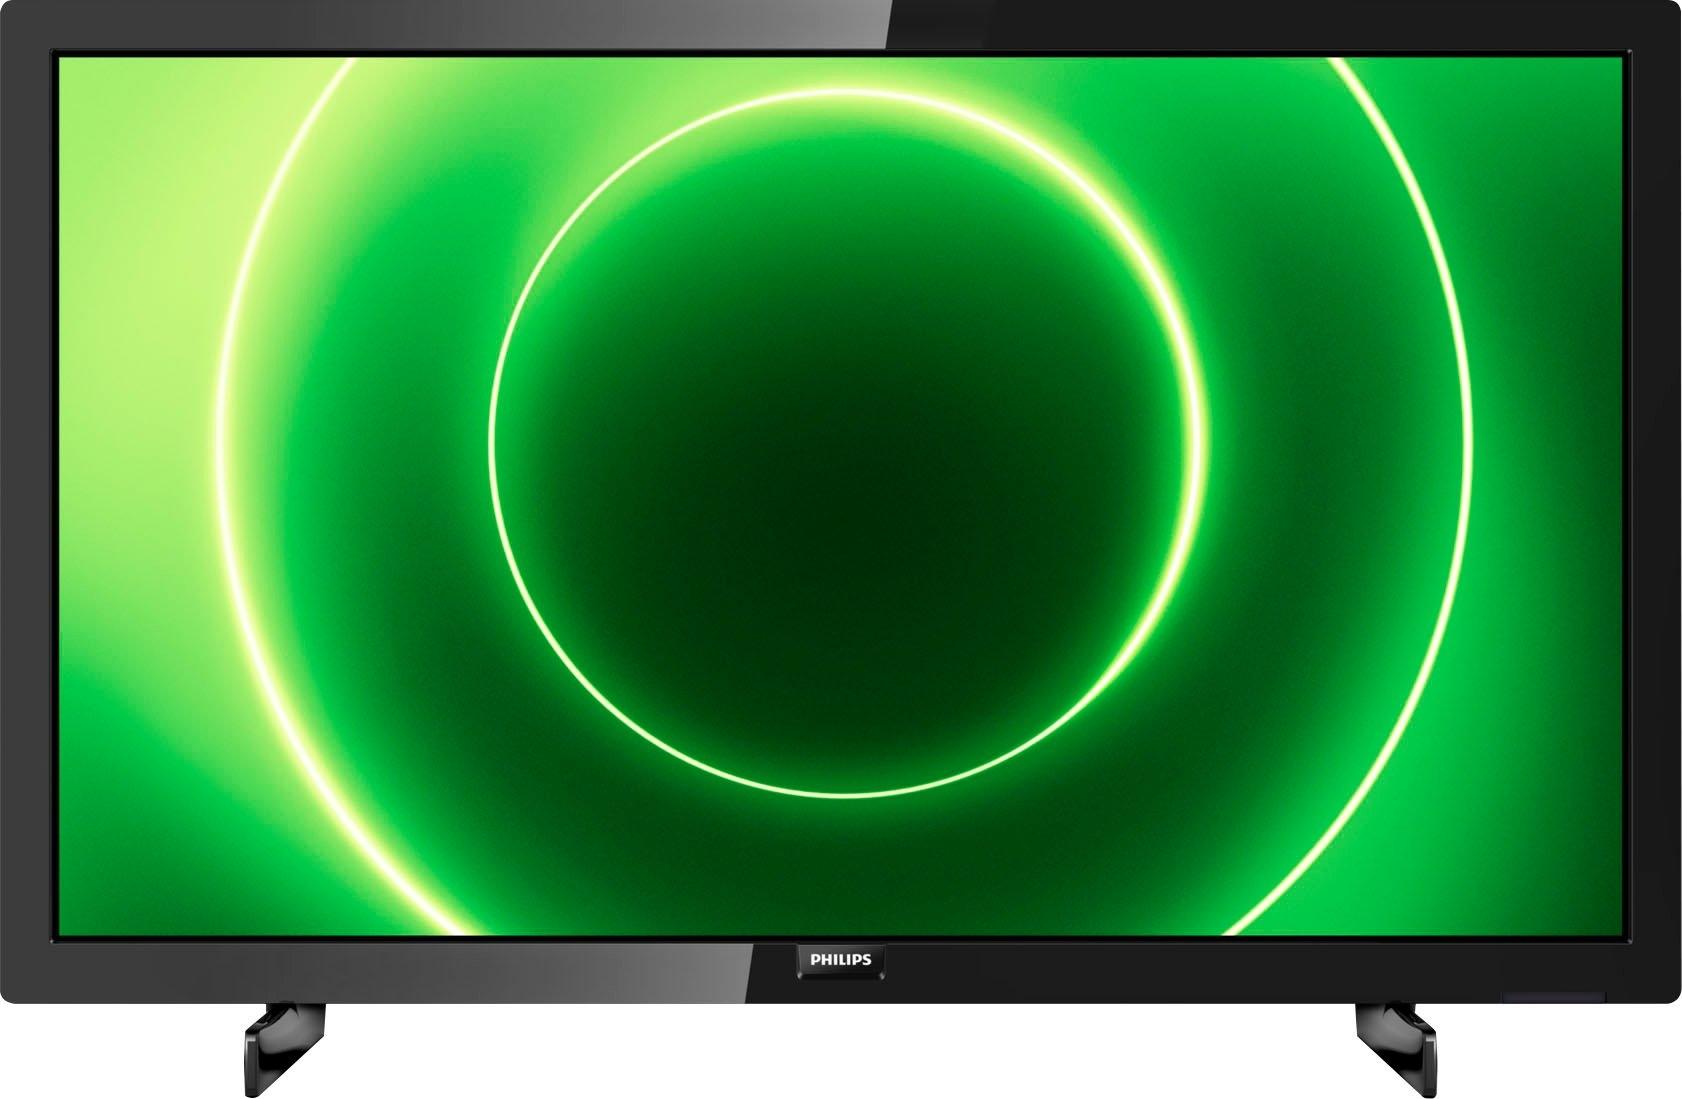 Philips led-TV 24PFS6805/12, 60 cm / 24